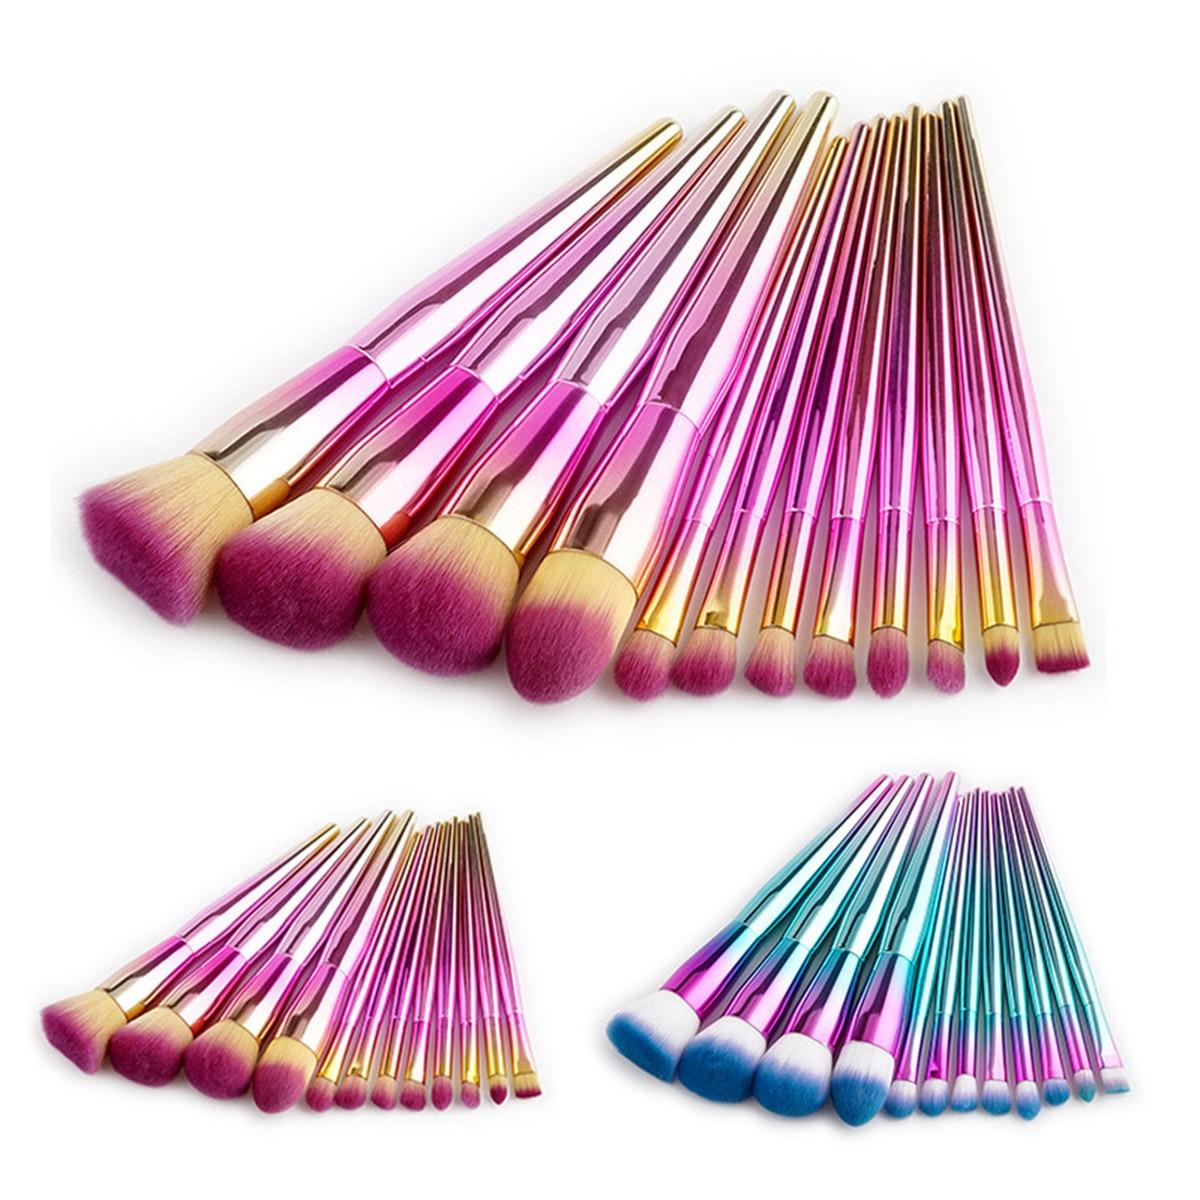 12 Pcs Professional Makeup Brushes Pink/blue Gradient Cosmetic Tools Foundation Scatter Powder Eyeshadow Blush Make Up Brush Kit стоимость